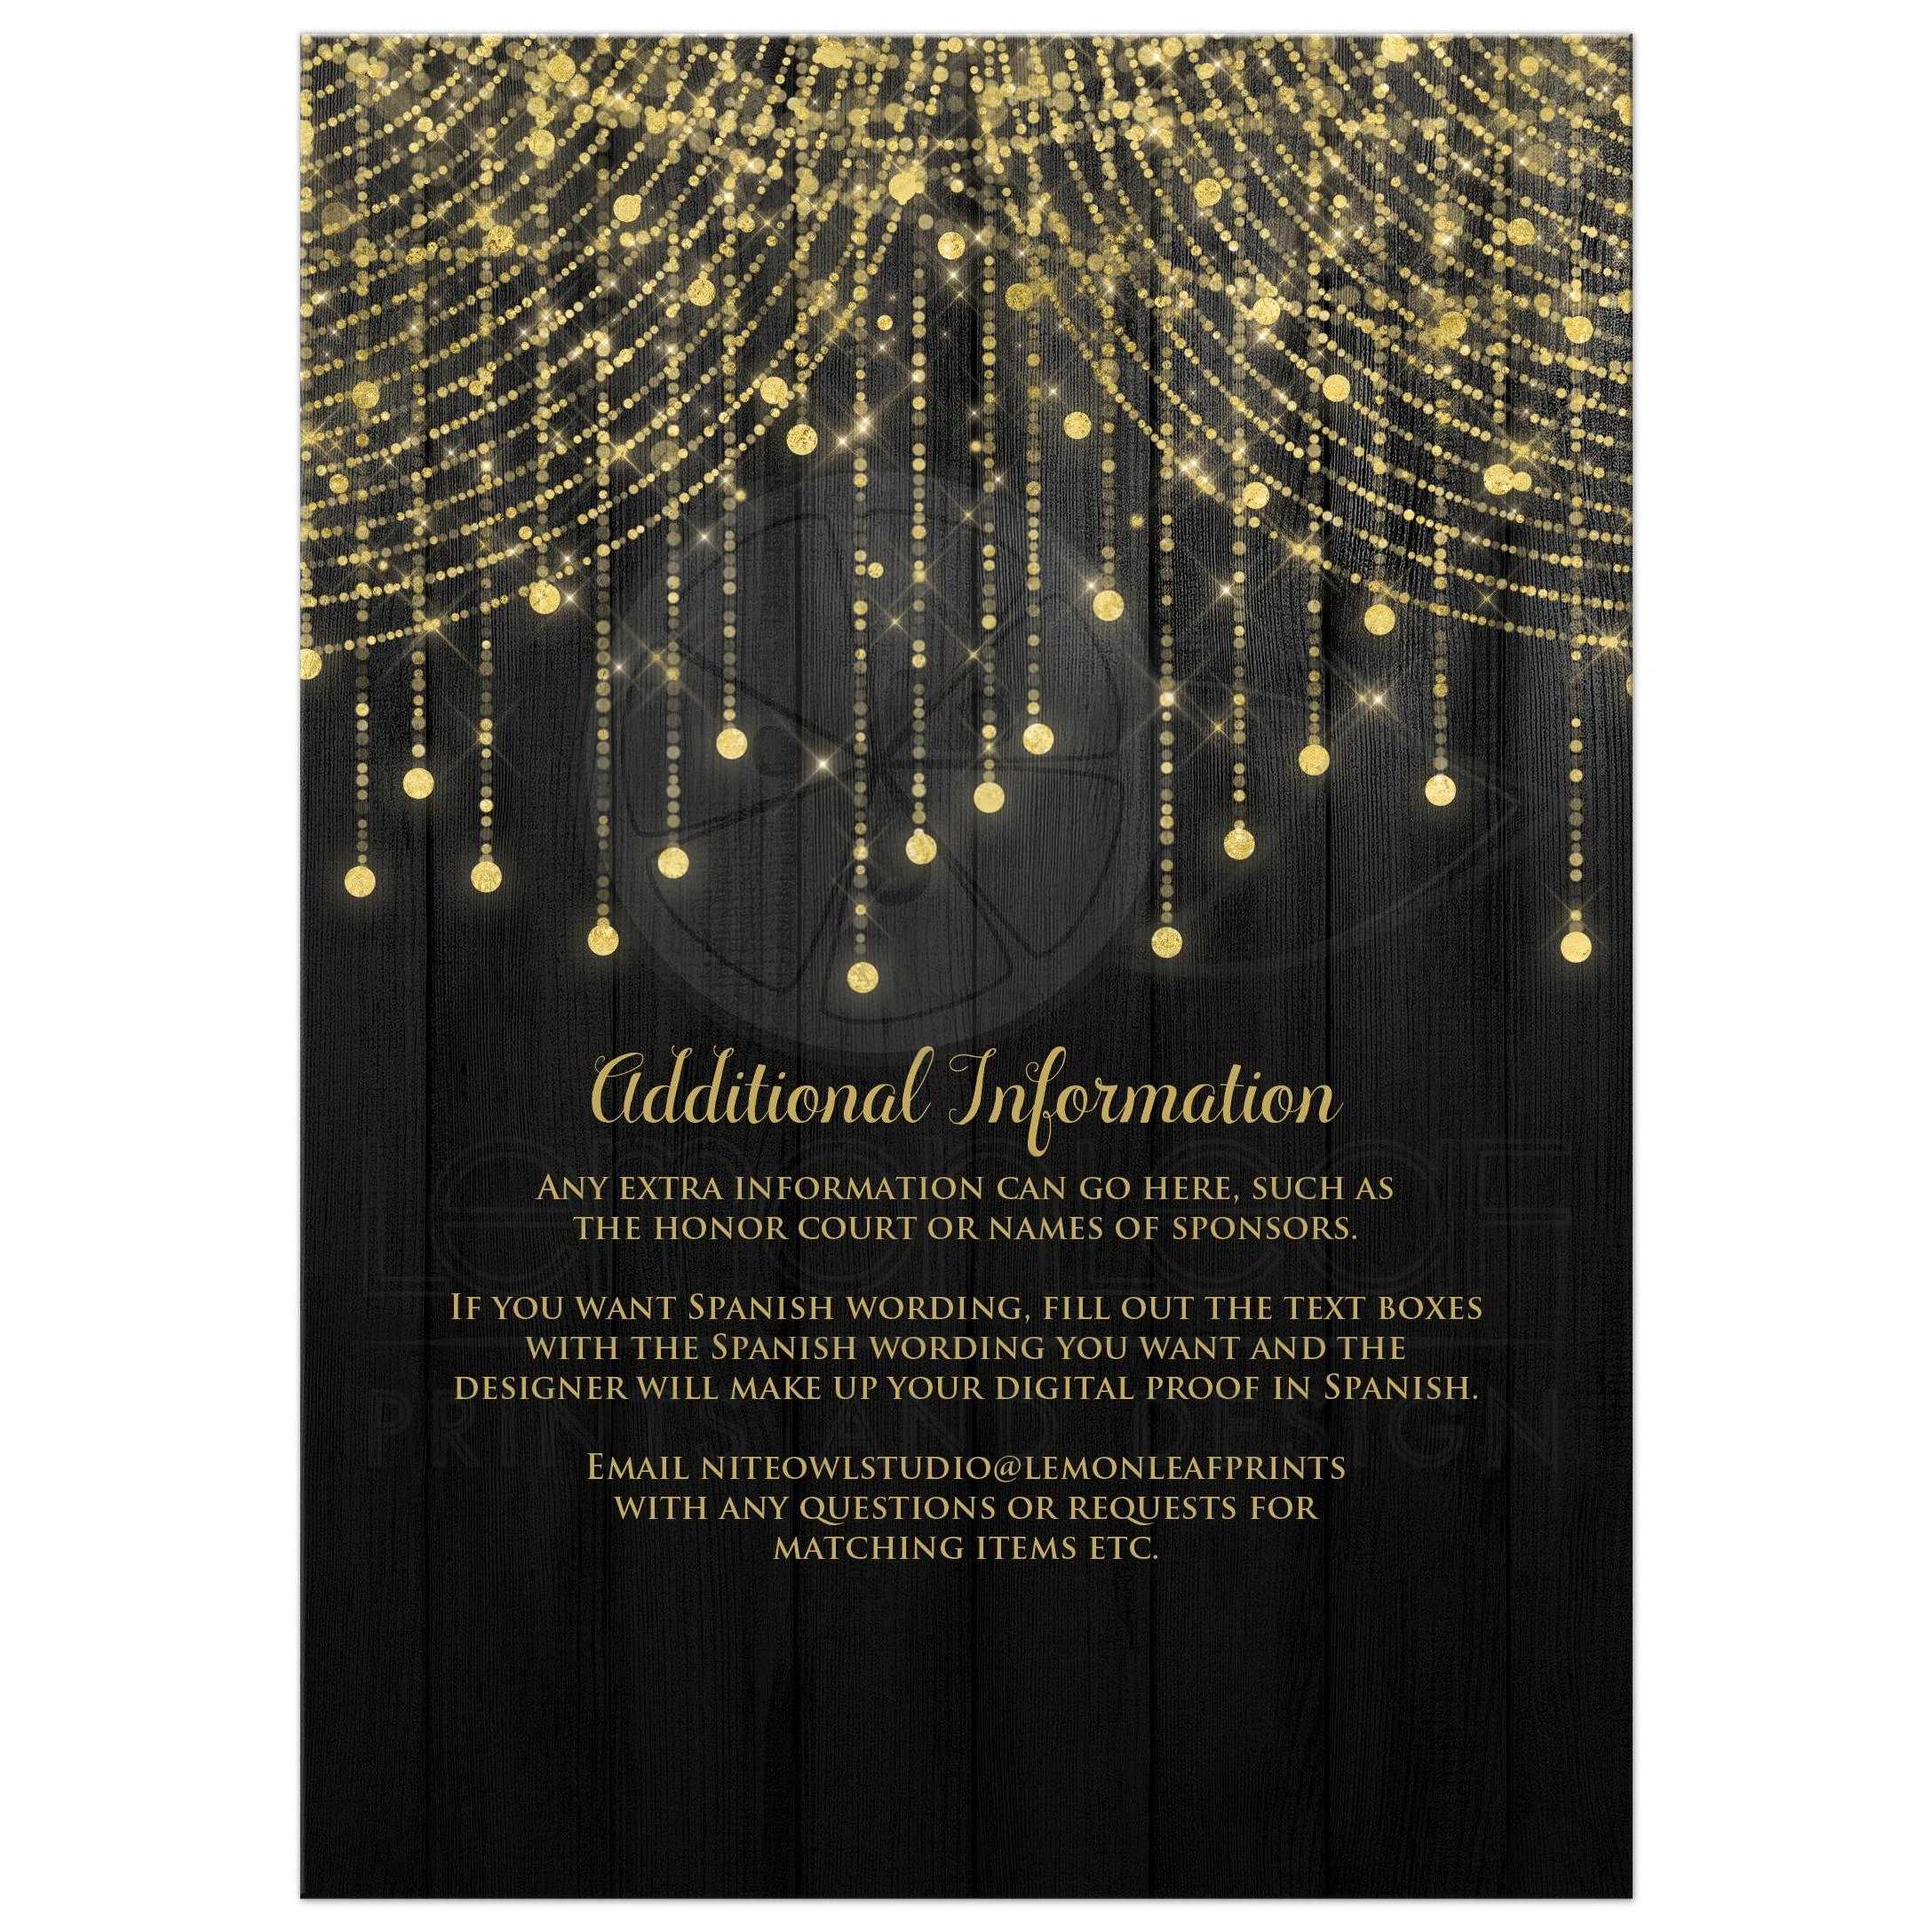 Quinceañera Invitation | Black and Gold Twinkle Light Cascades